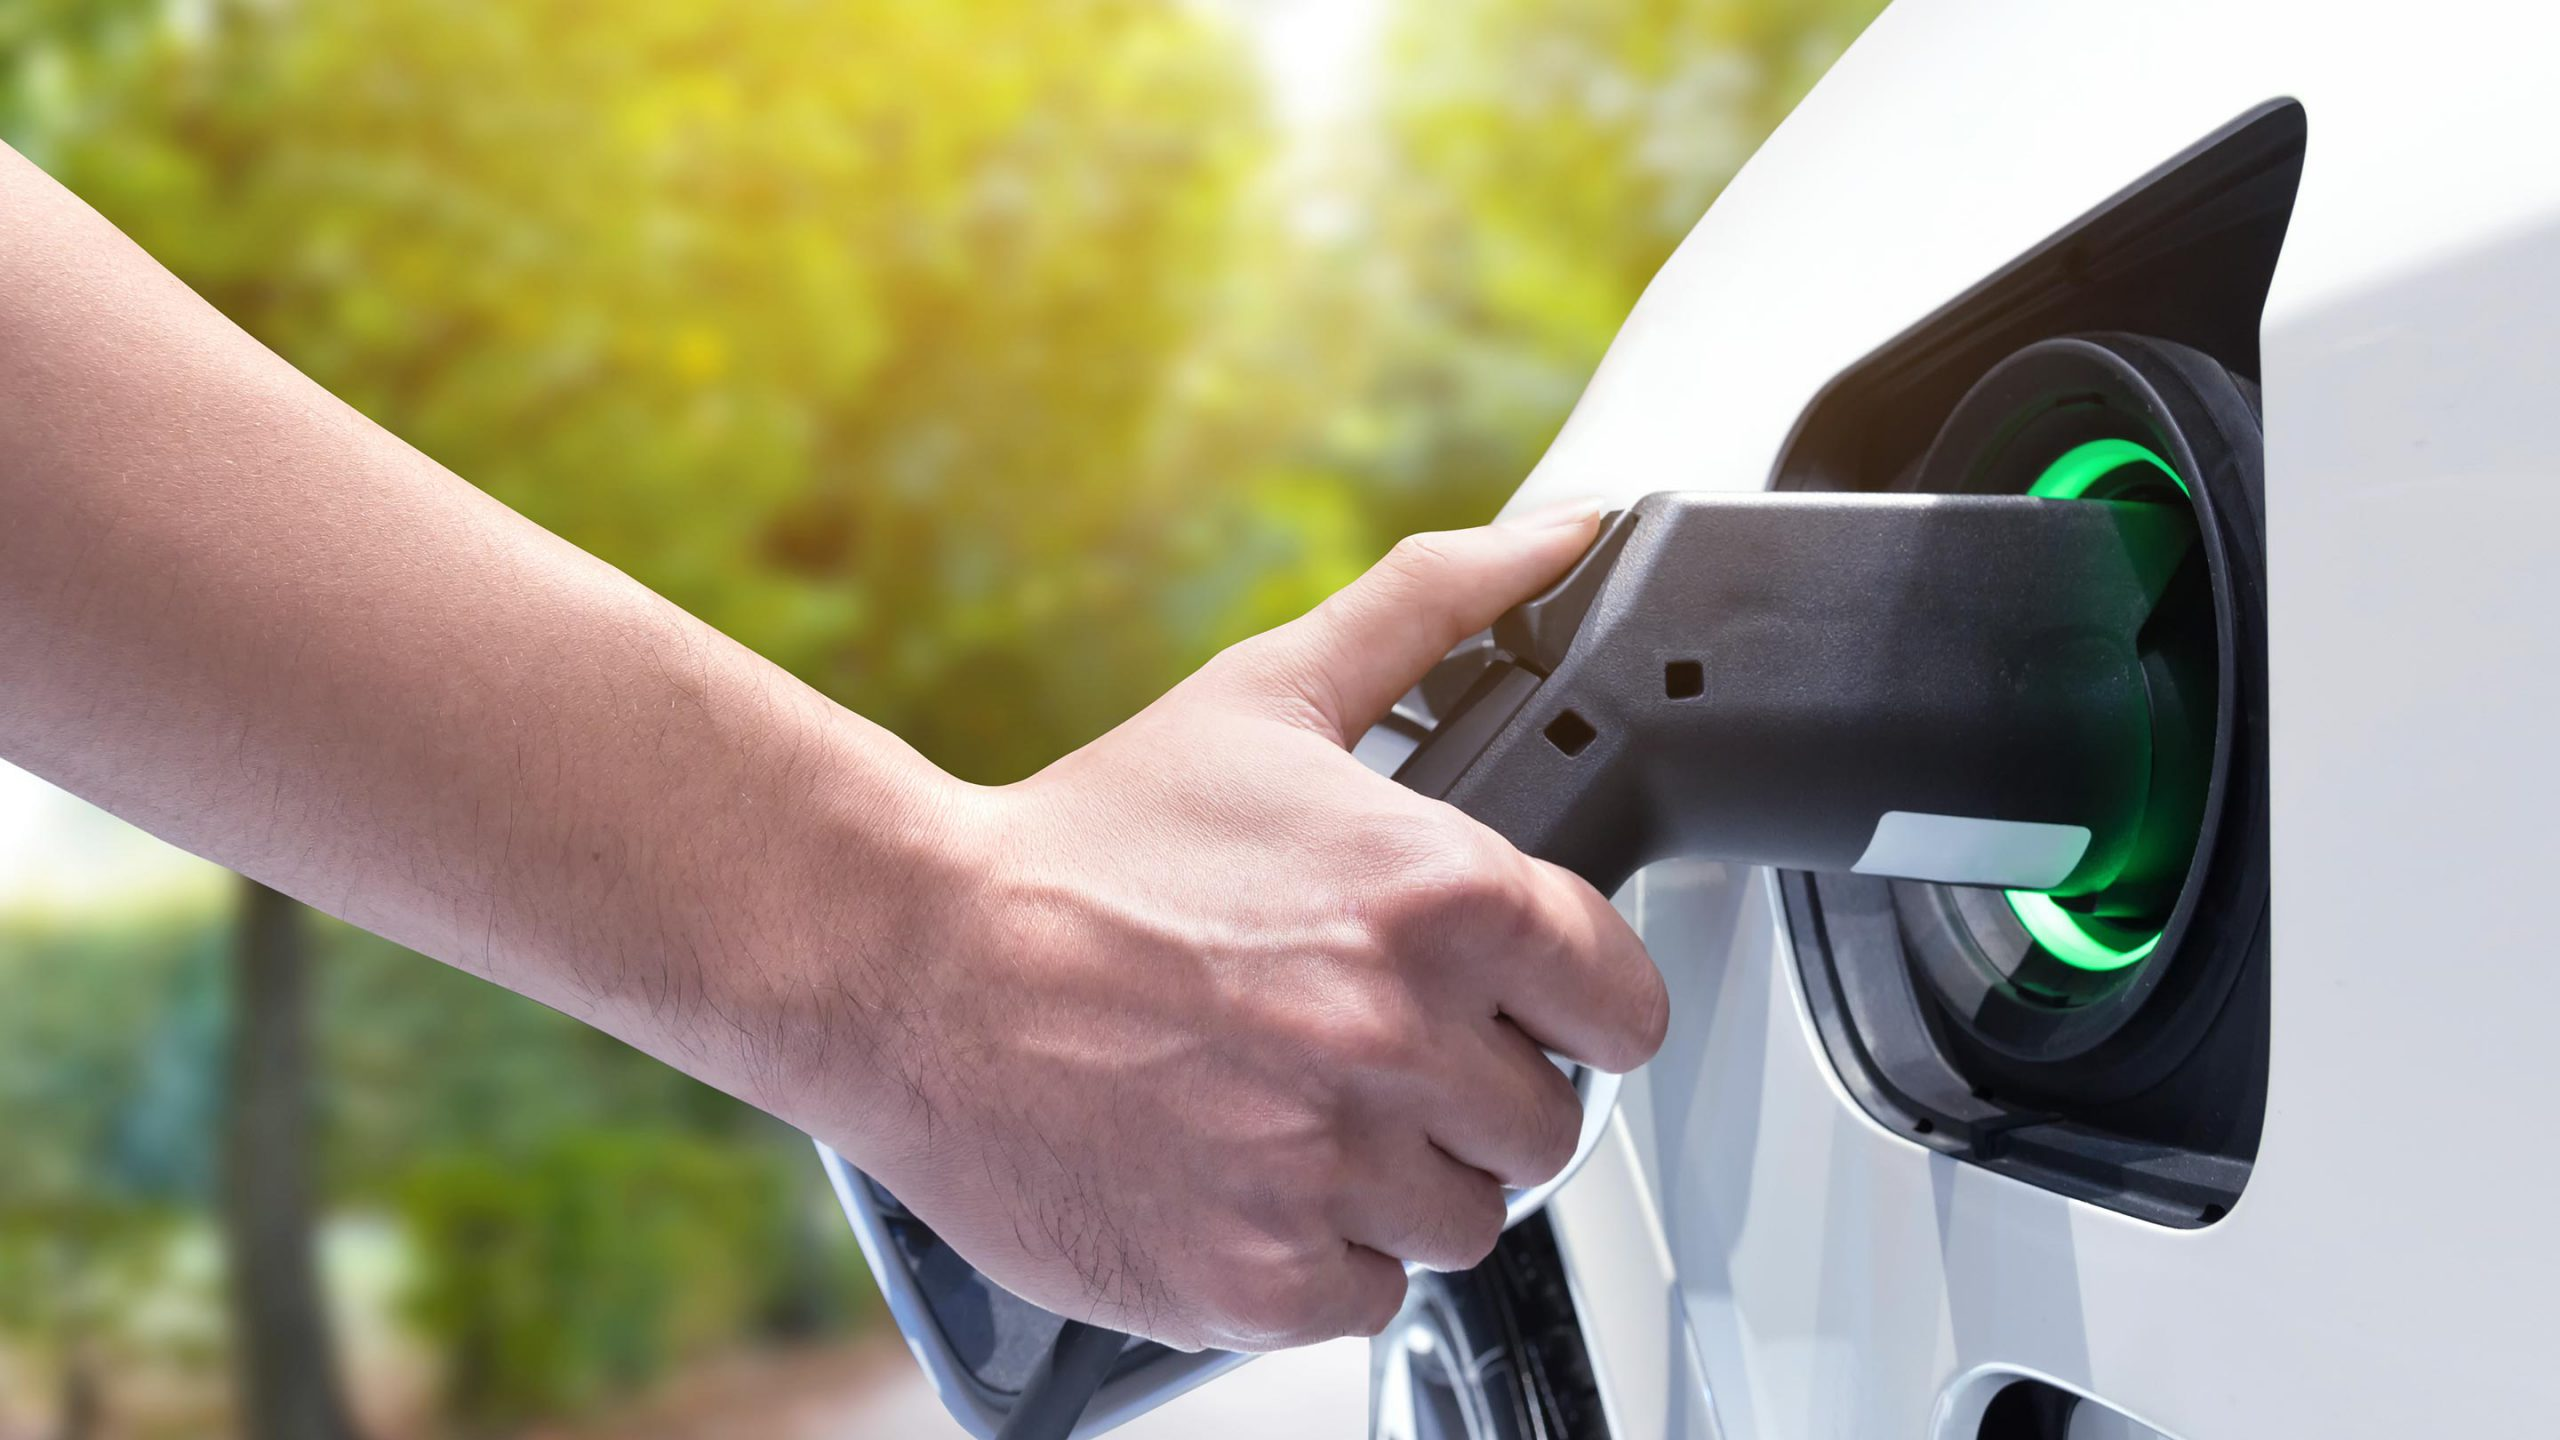 Electric vehicle fleets